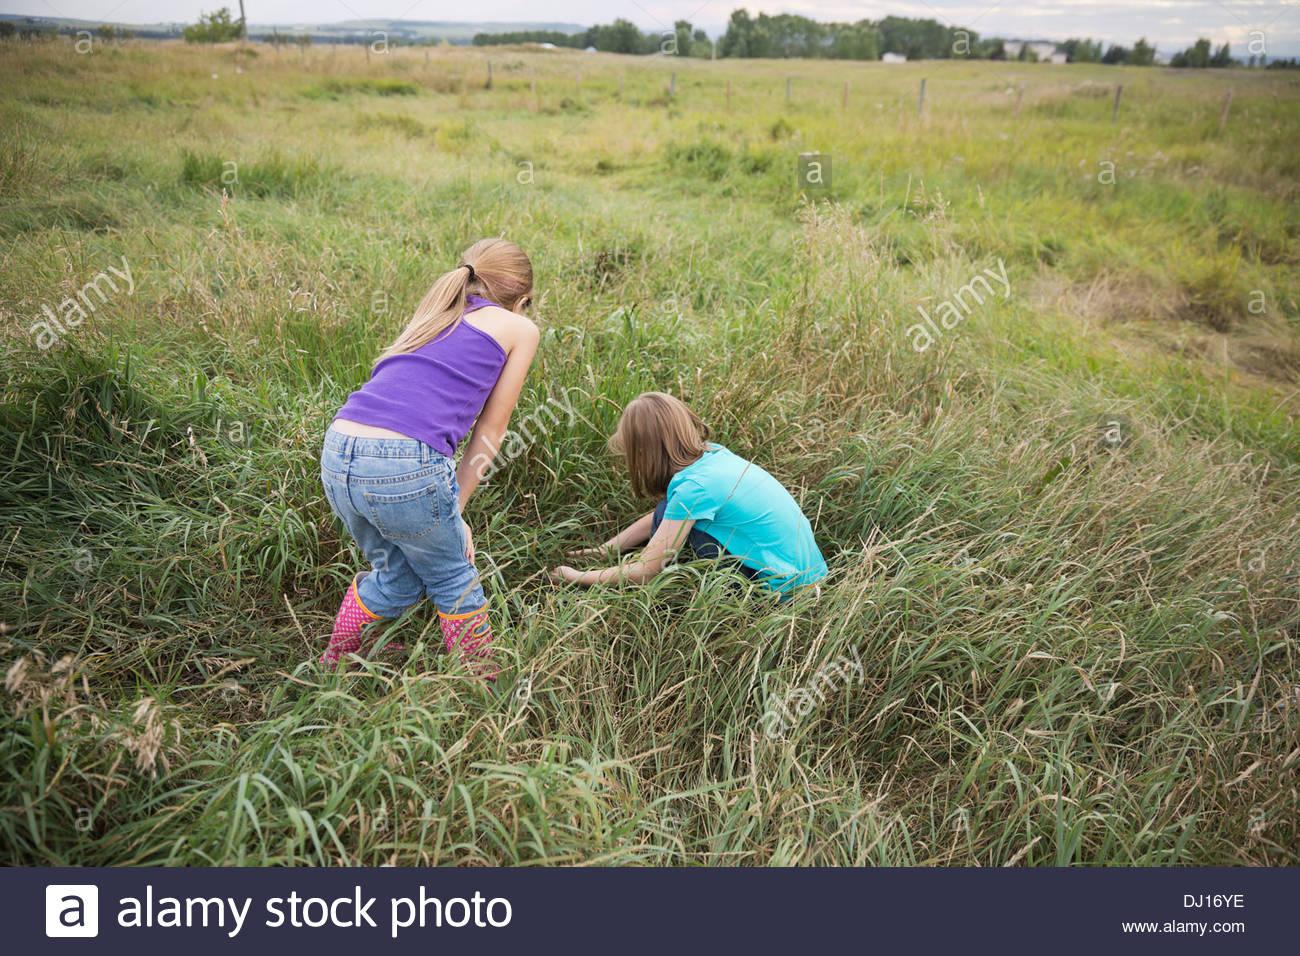 Girls exploring plants in field - Stock Image